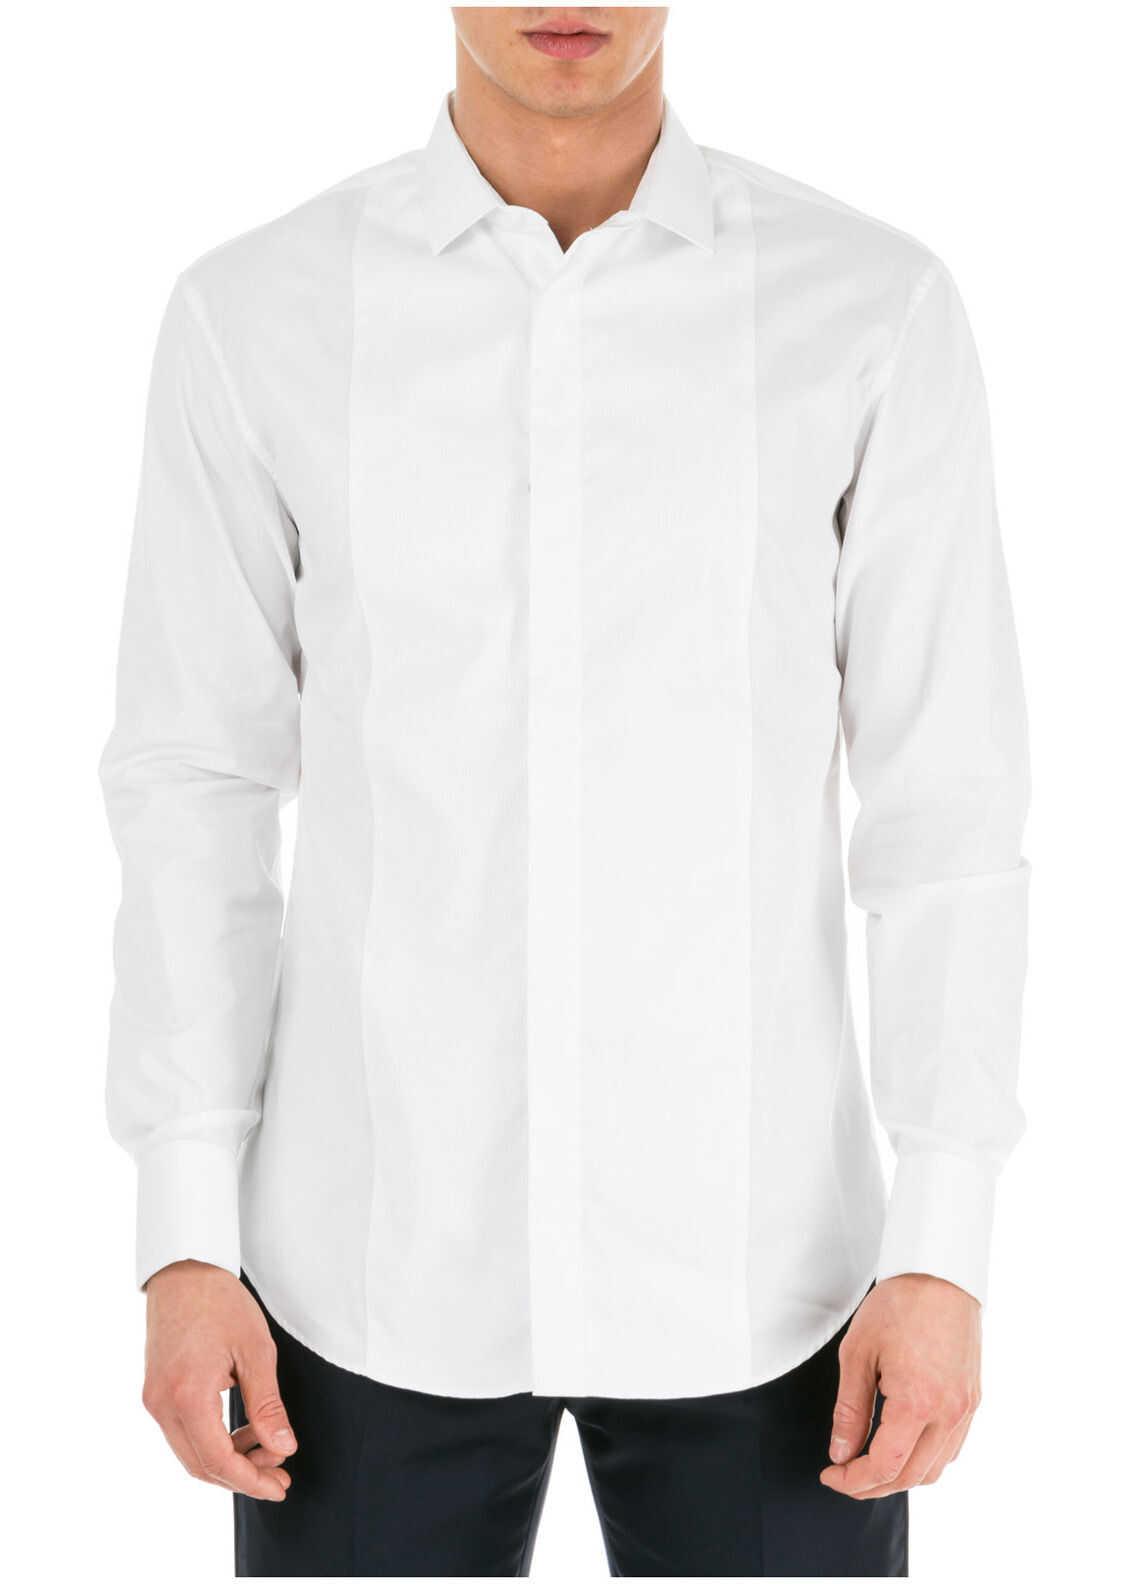 Emporio Armani Dress Shirt White imagine